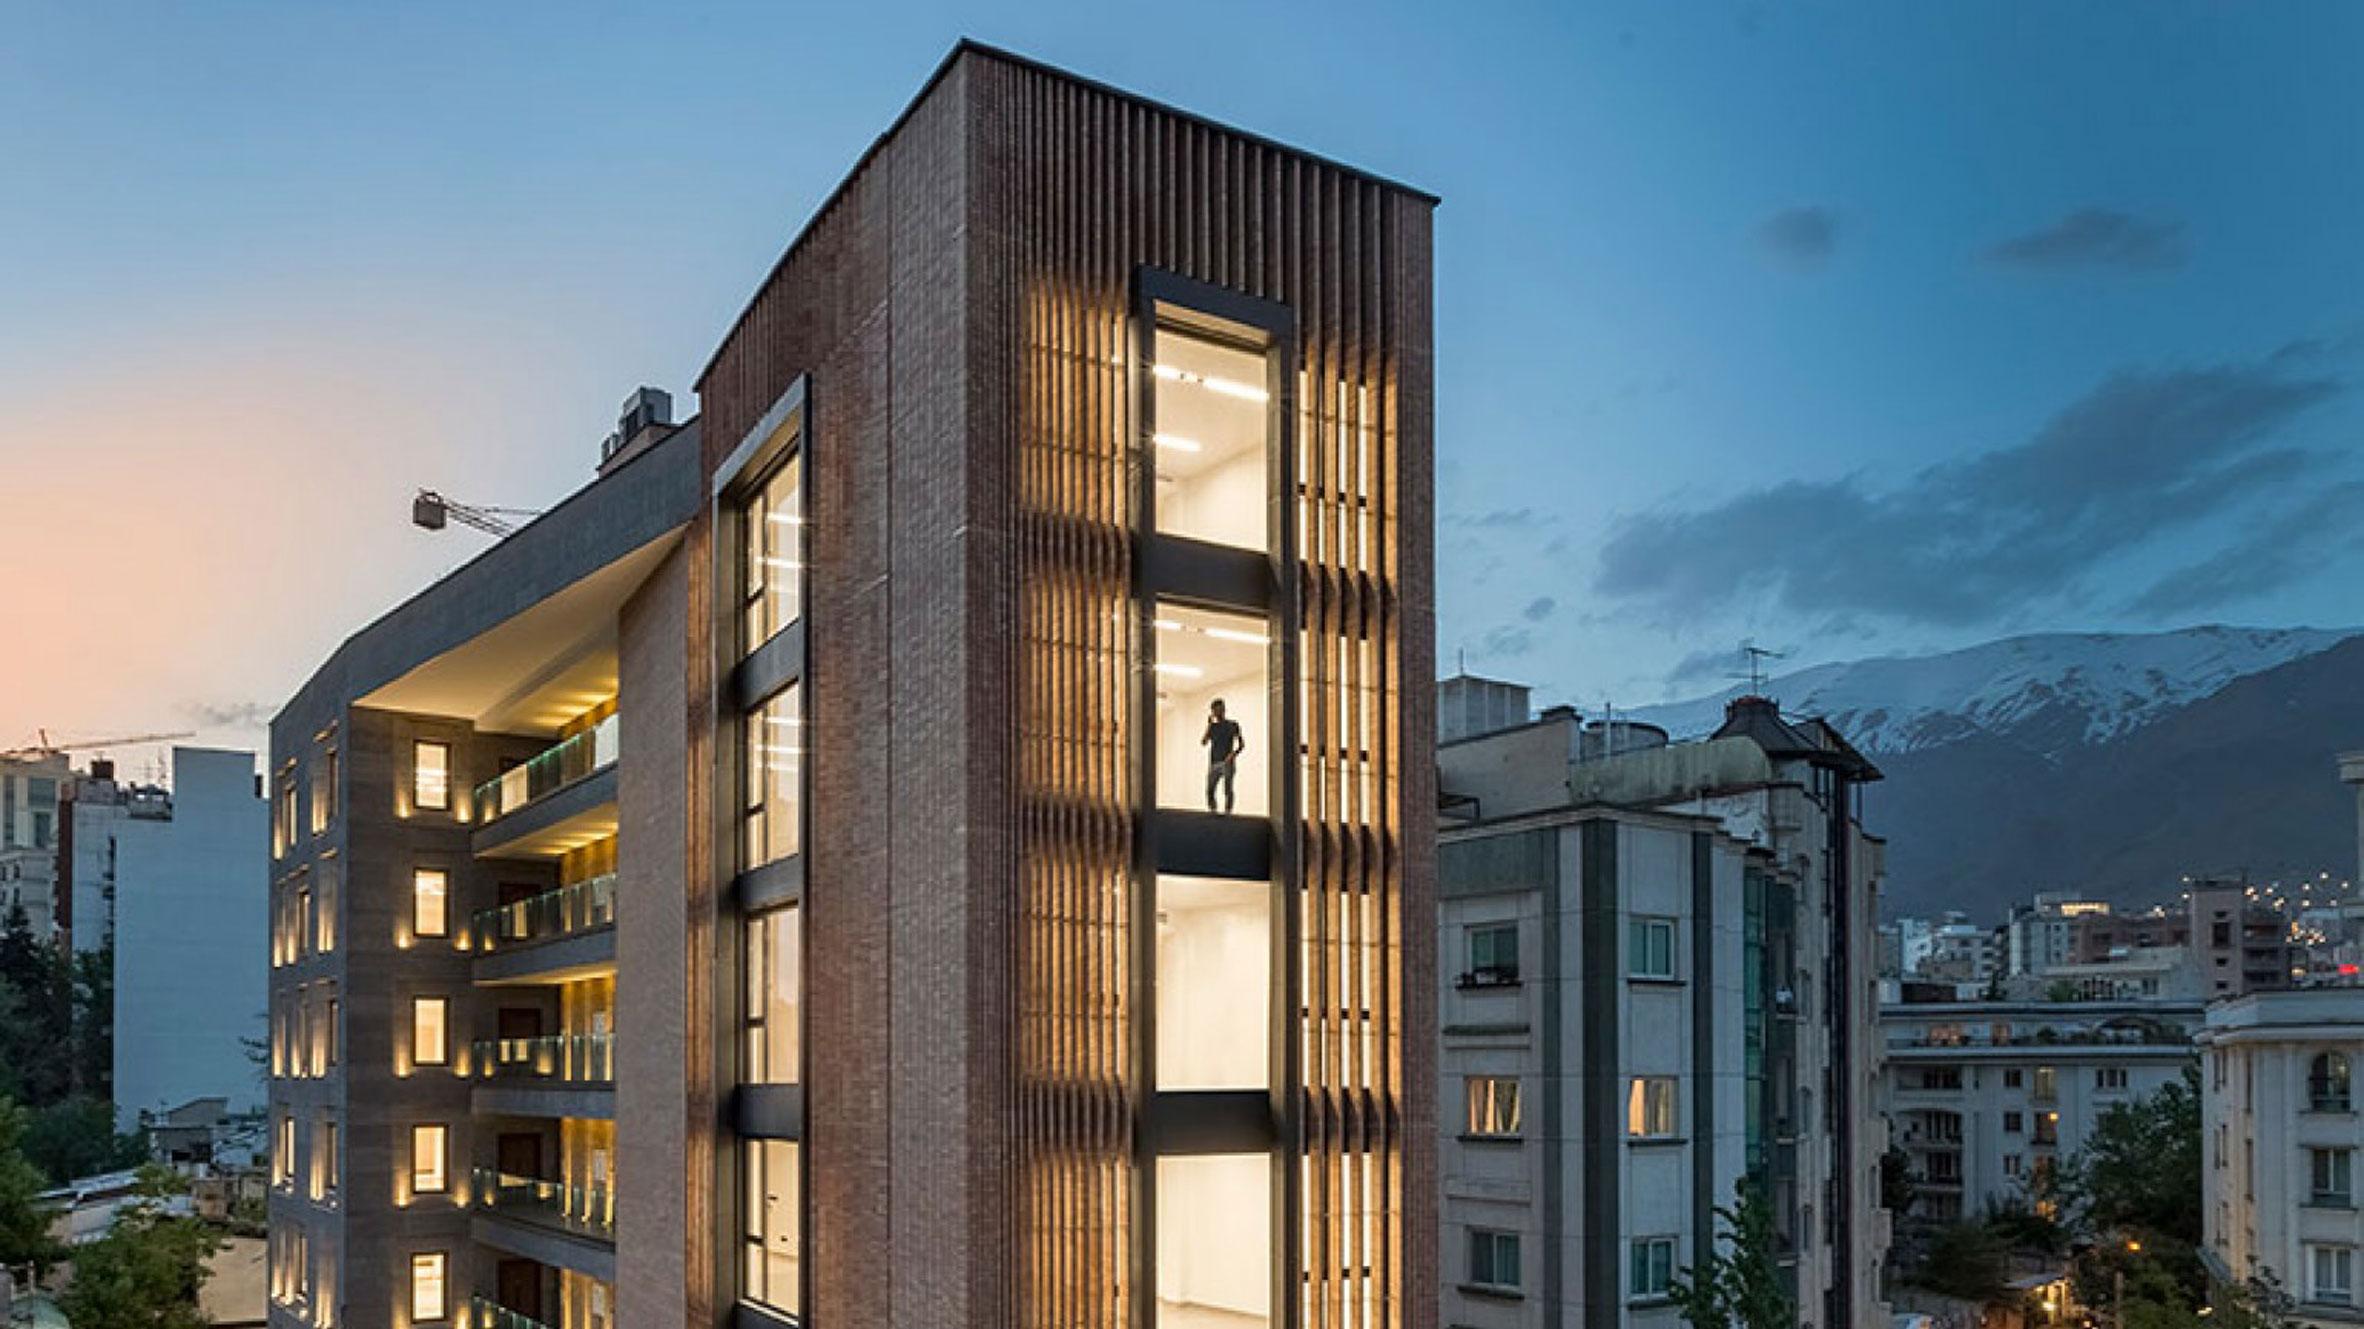 Saba Commercial Building, Tehran, Iran, by SBAD office and 7Hoor Architecture Studio